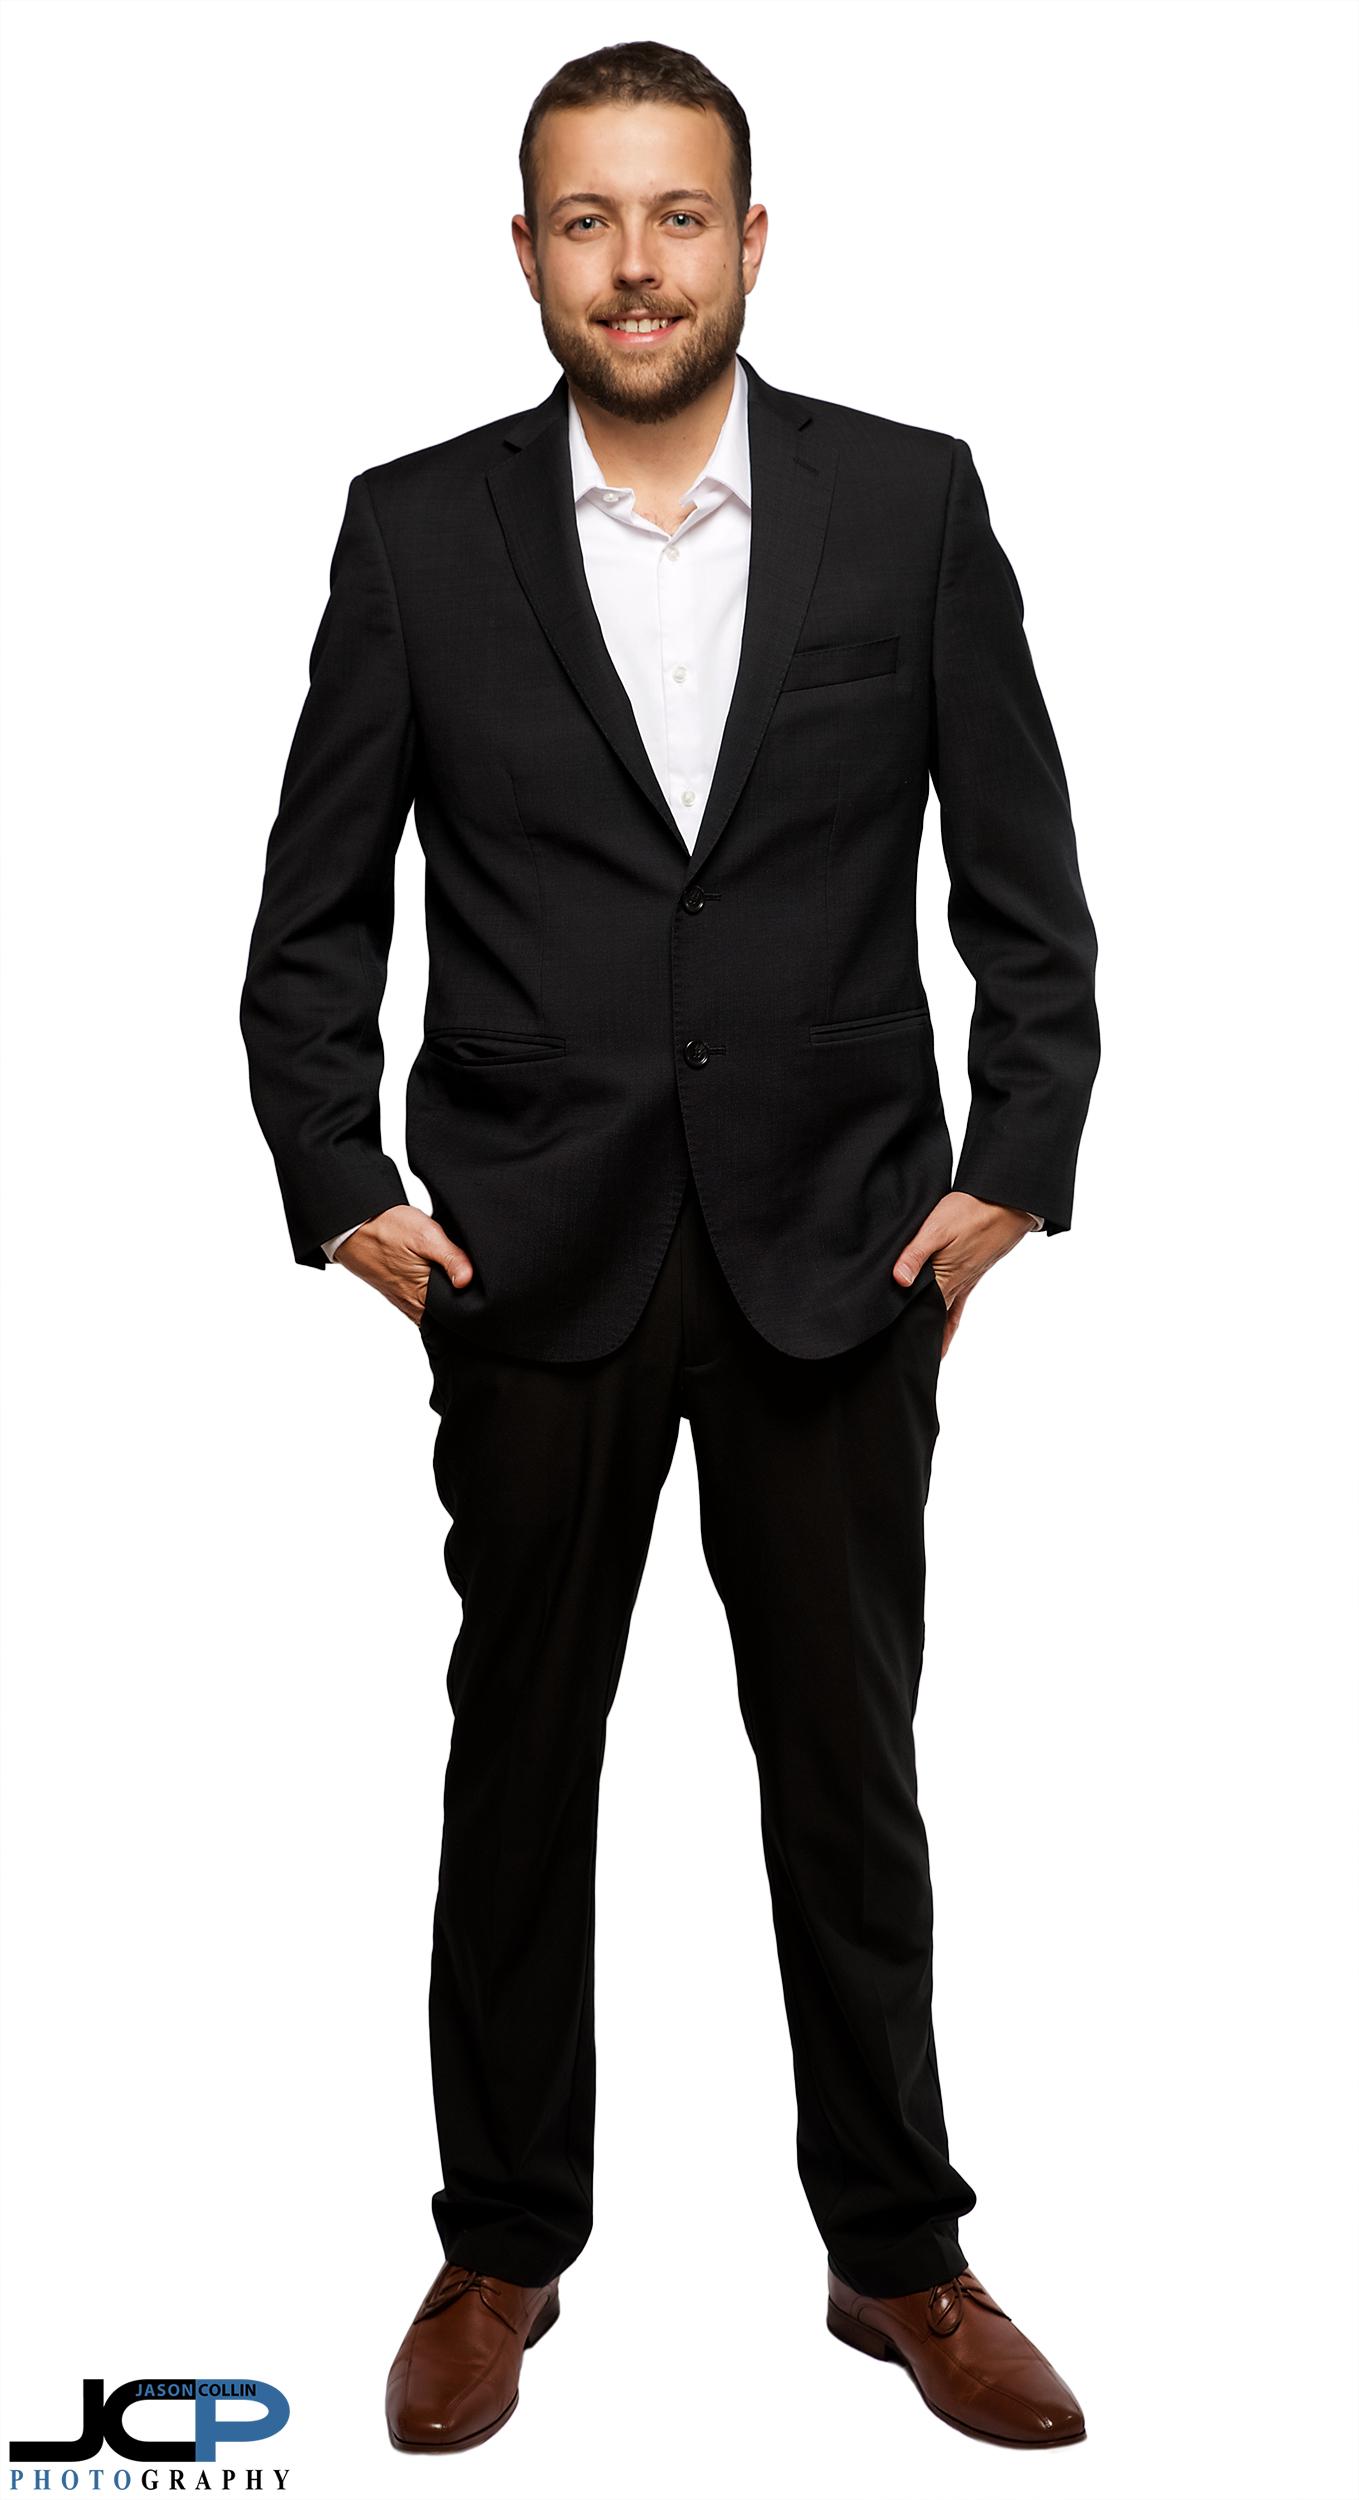 head to toe real estate agent headshot abq